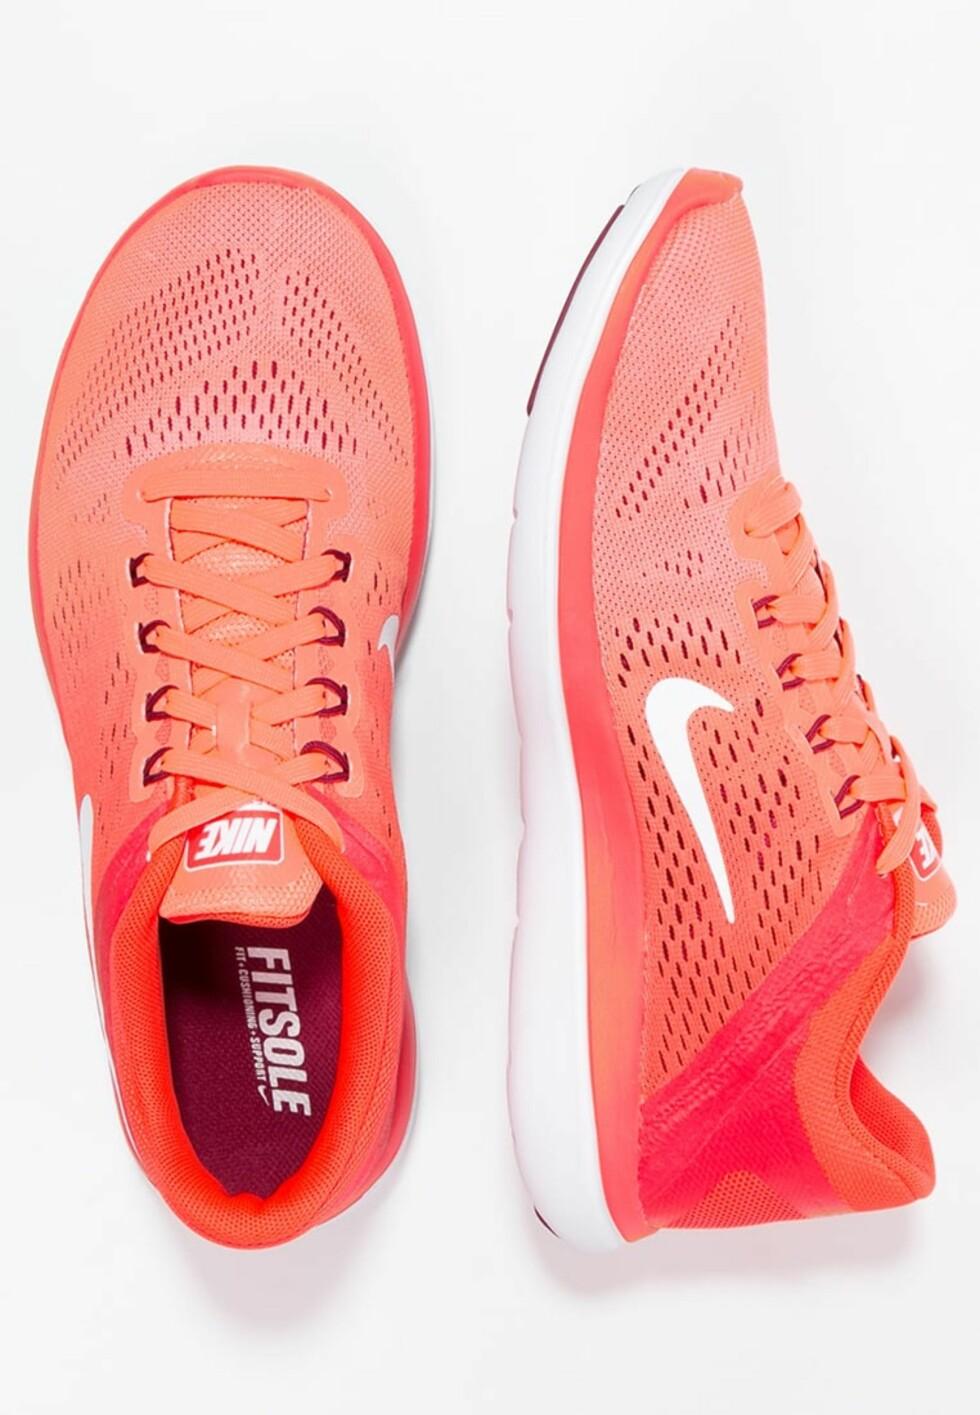 Joggesko fra Nike via Zalando.no | kr 663 | http://marketing.net.zalando.no/ts/i4062628/tsc?amc=aff.znd.47259.54735.57747&rmd=3&trg=https%3A%2F%2Fwww.zalando.no%2Fnike-performance-flex-2016-rn-lette-lopesko-n1241a0ex-g11.html%3Fwmc%3DAFF47_IG_NO.%23%7BPARTNER_ID%7D_%23%7BADSPACE_ID%7D..